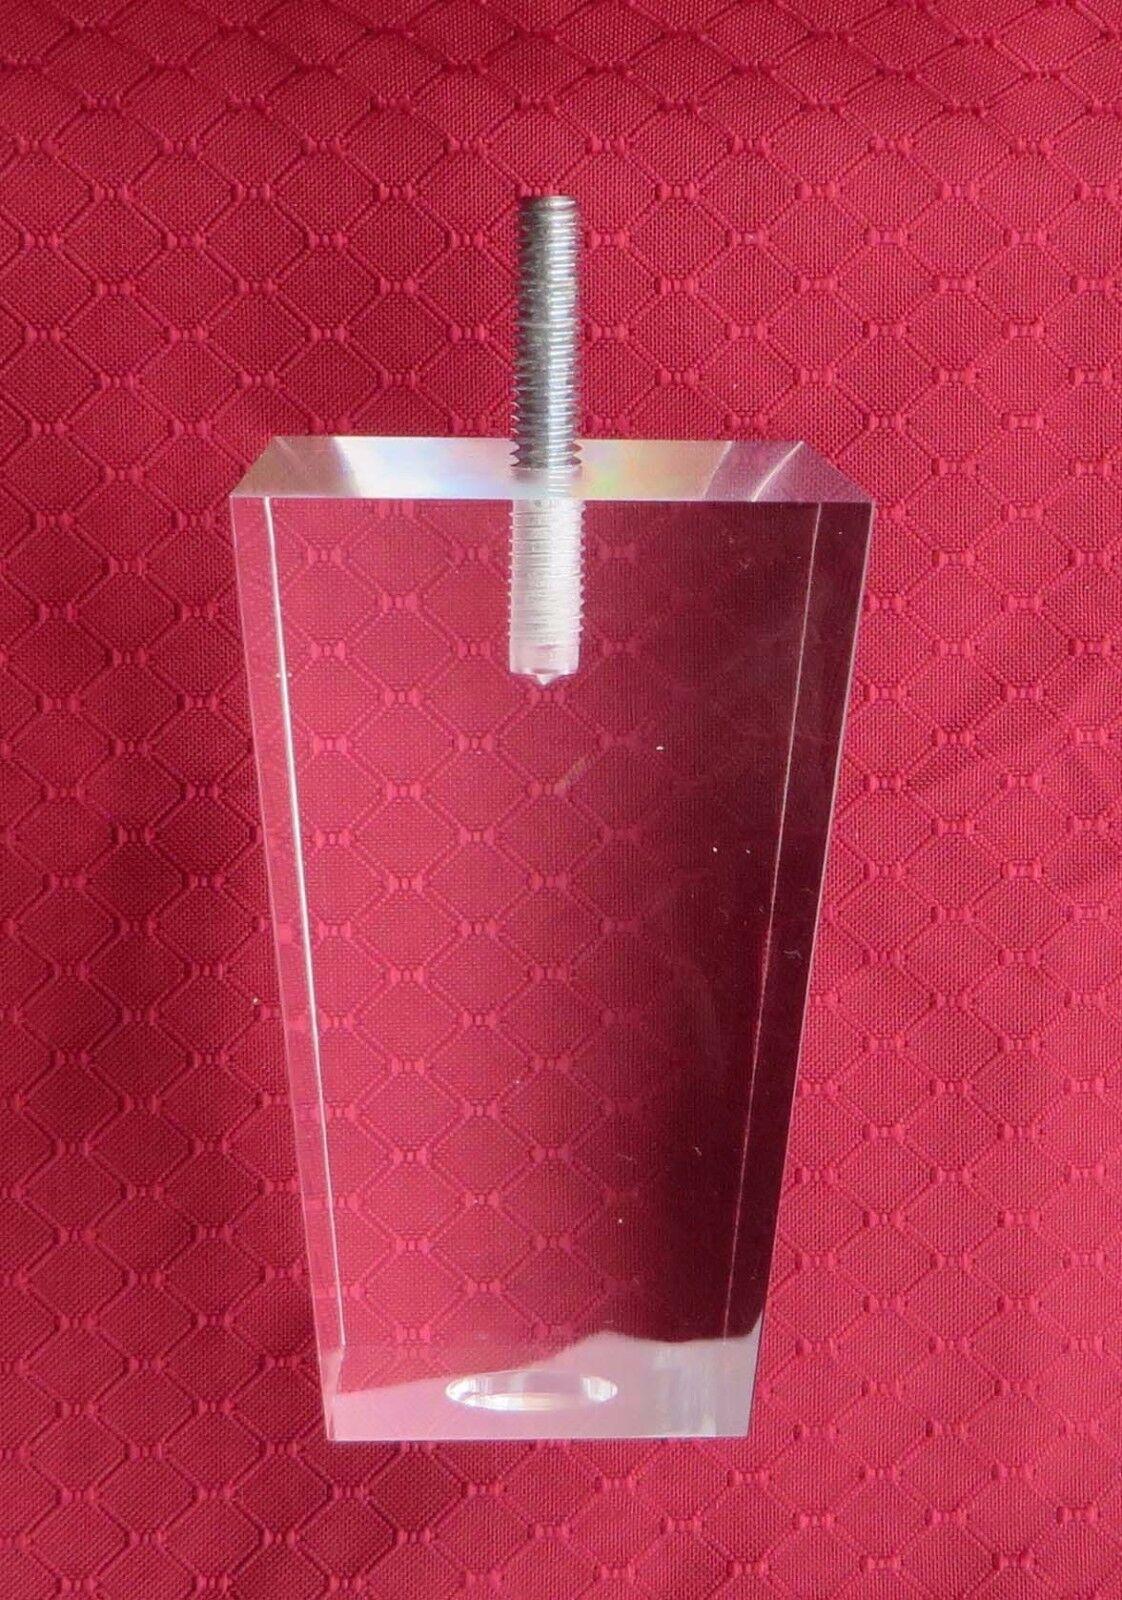 Acrylic Leg for Furniture, Sofa, Cabinet Leg 4  Pyramid, 4PC Quality Fast Ship